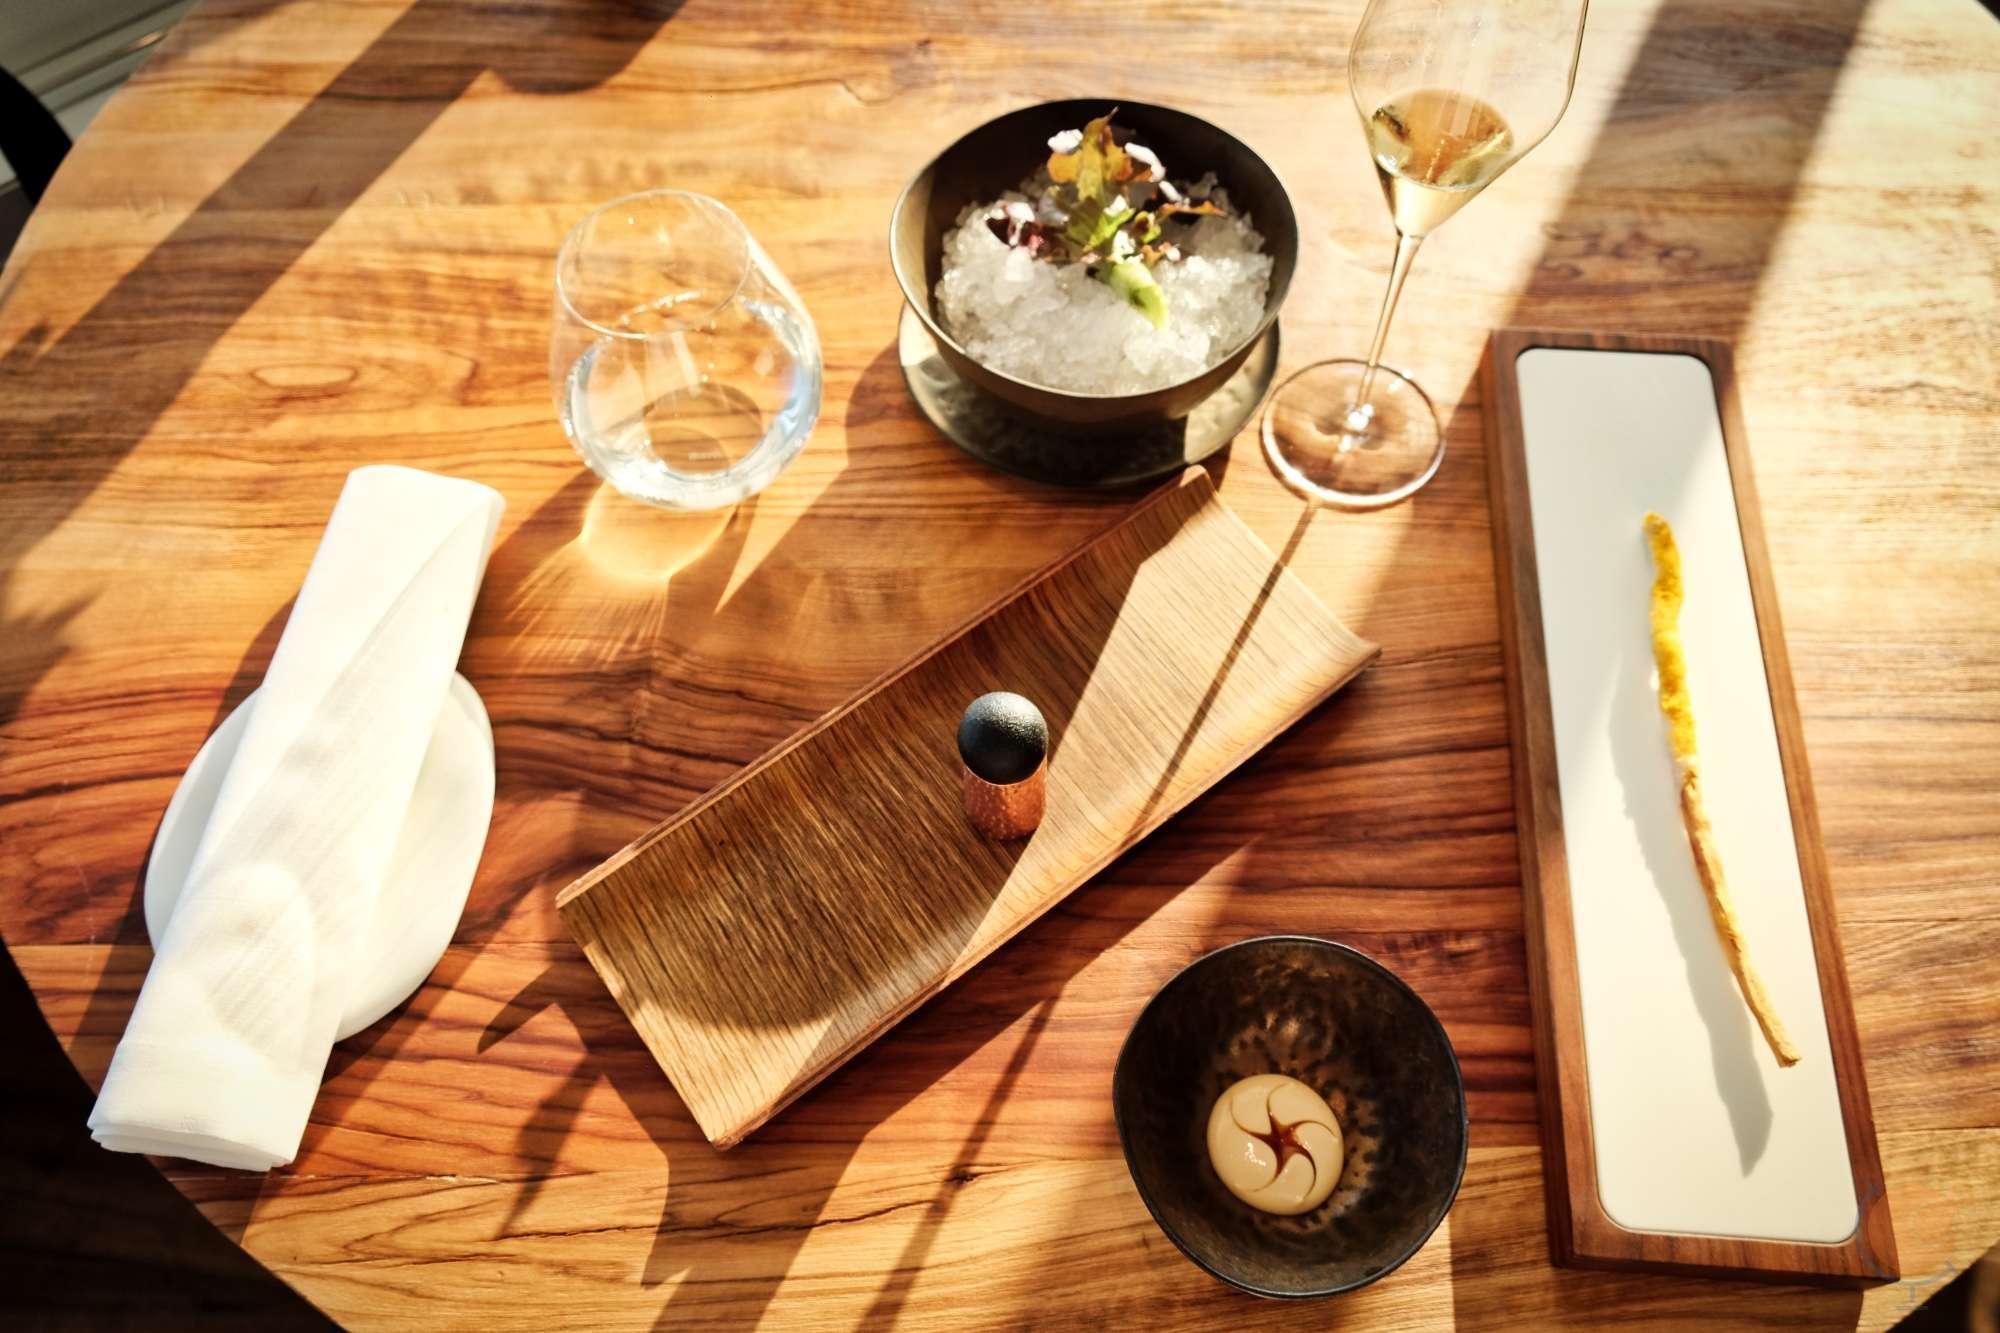 dscf1155_mirazur_menton_colagreco_restaurant_michelin_50best_vilagevo_jokuti_andras_l_w_1.jpg